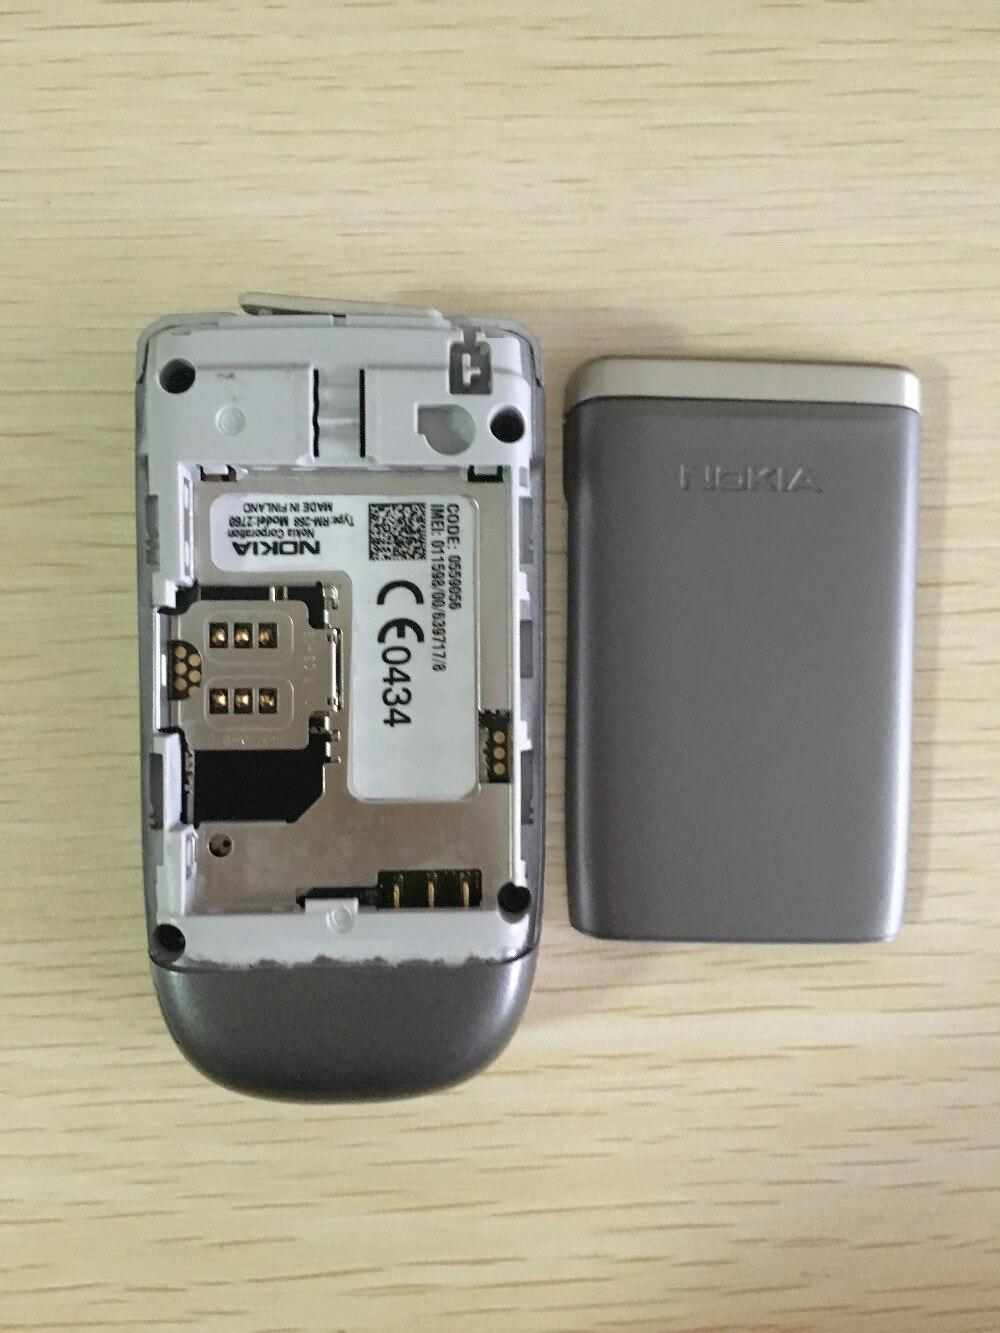 refurbished phones 567x8 mobile phonessecond hand - HD1000×1333